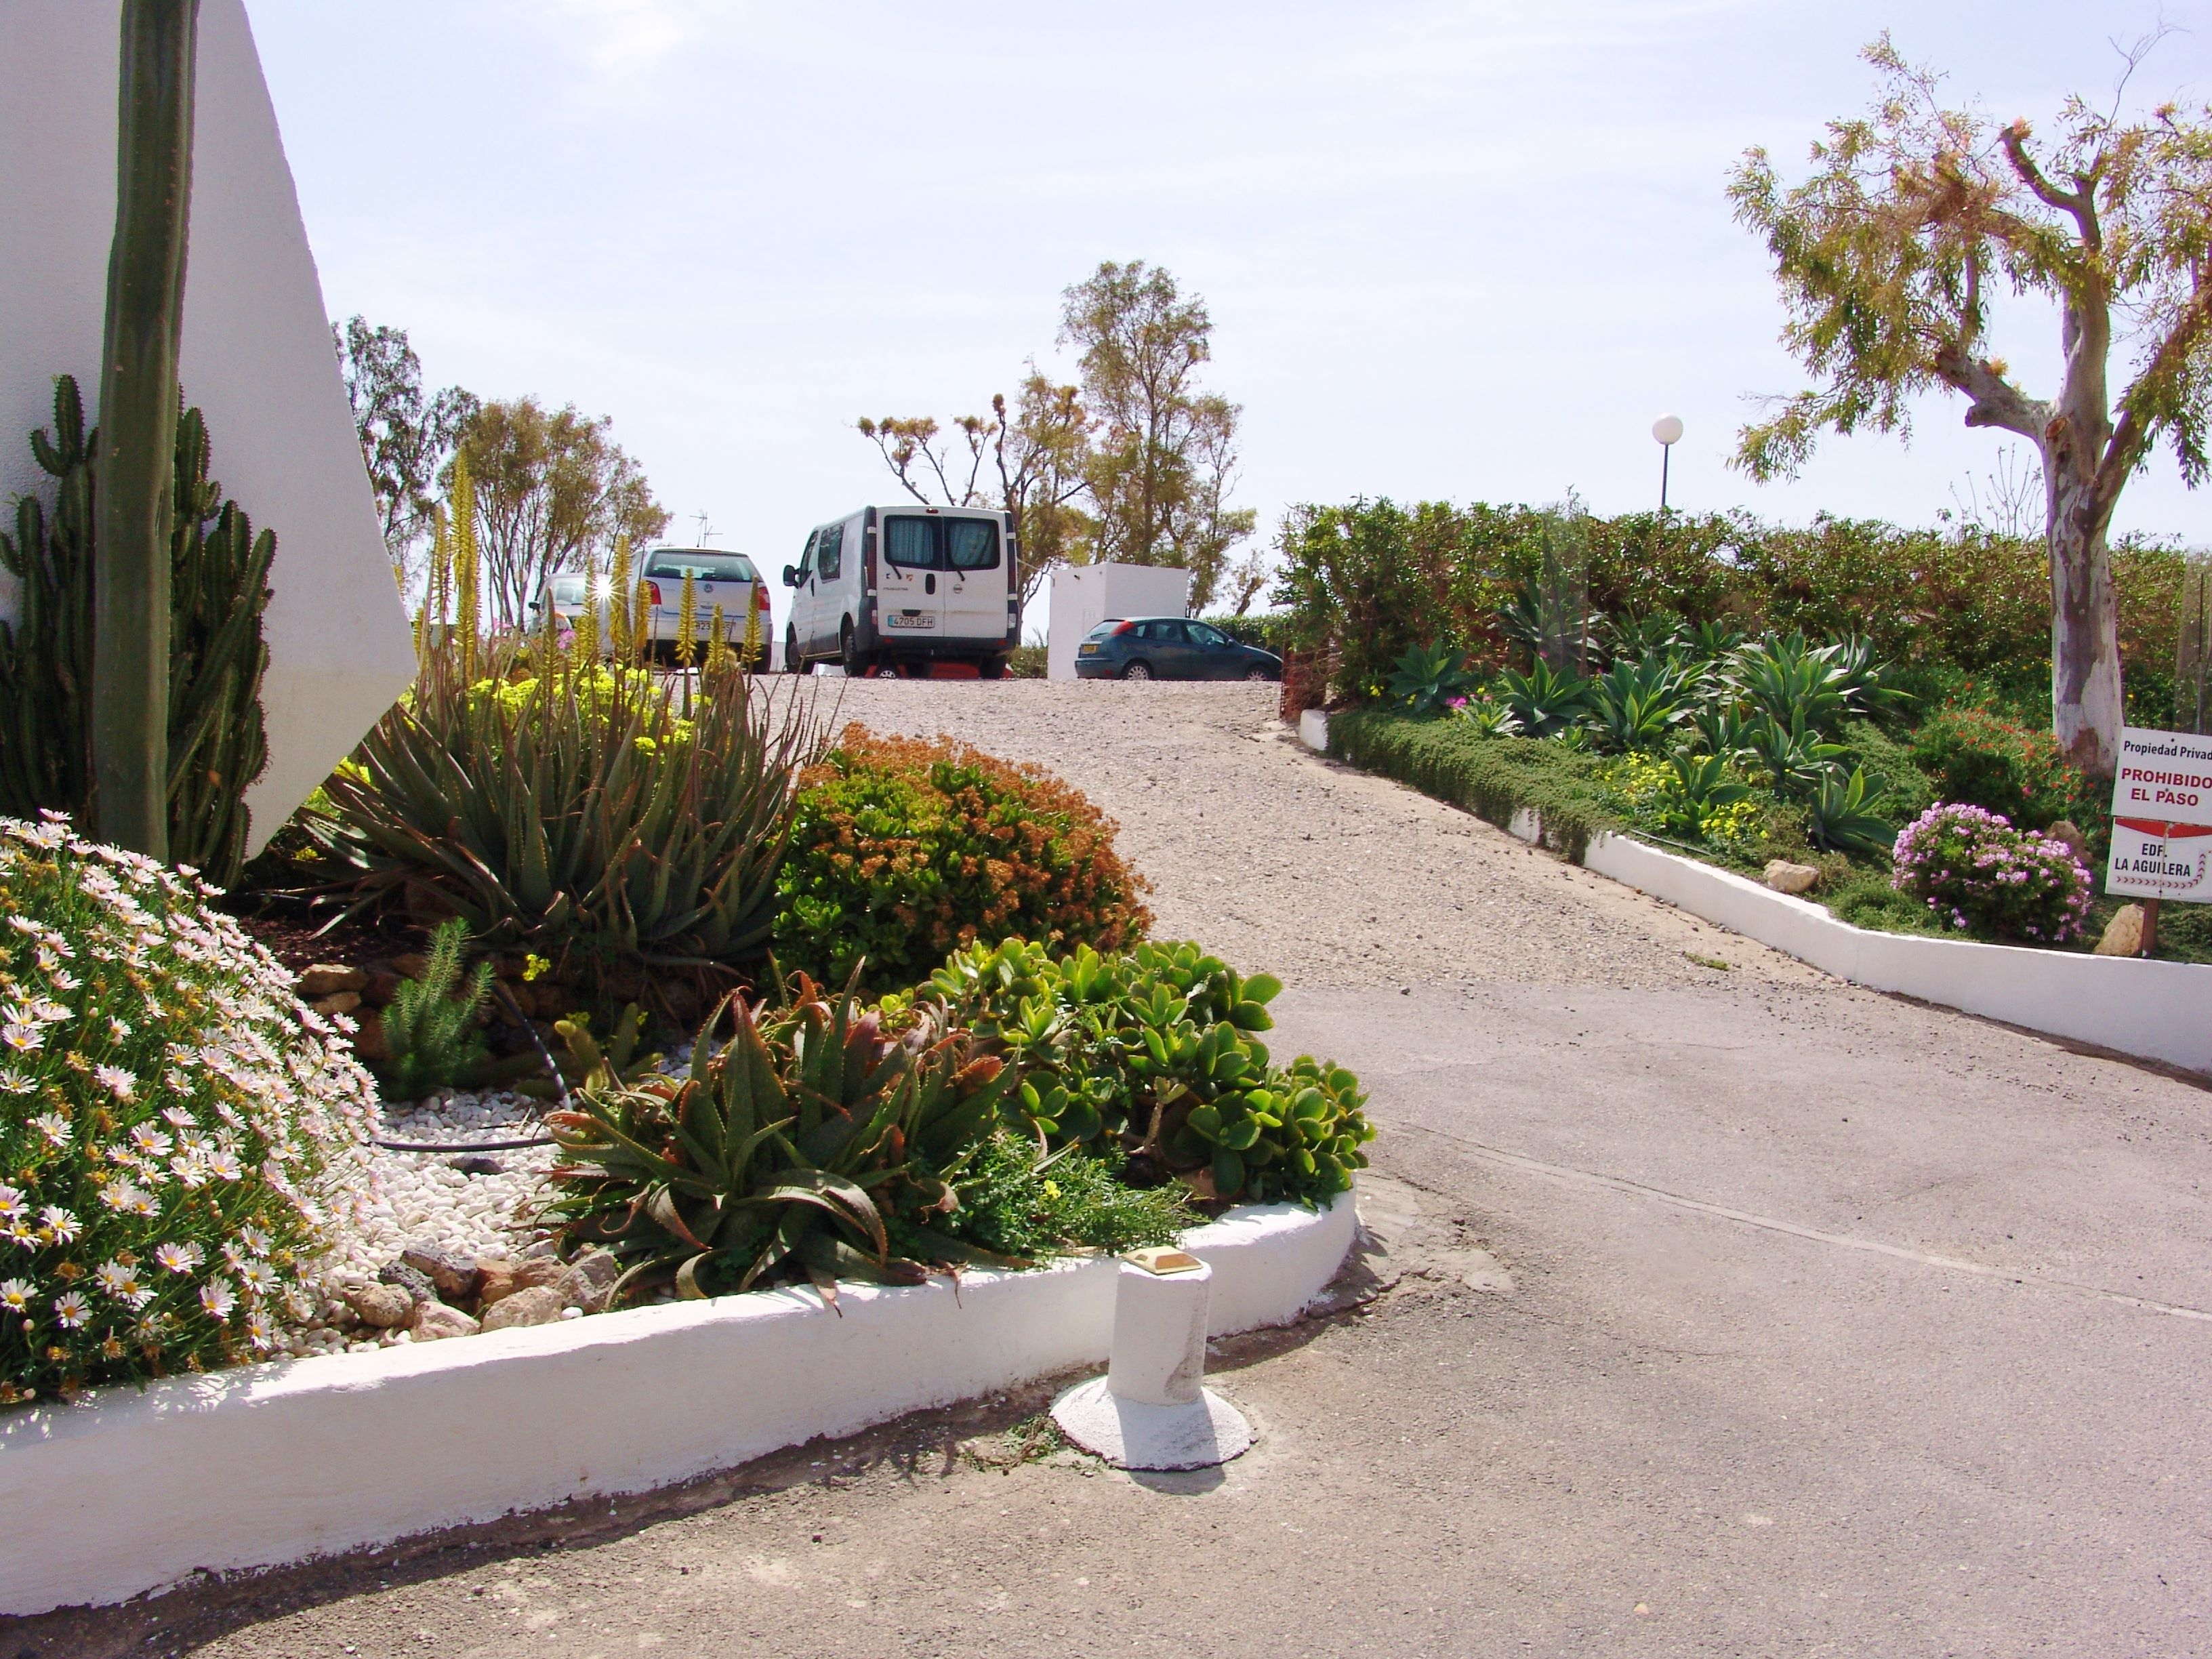 24 inmobiliaria piquer for Oficina catastro almeria